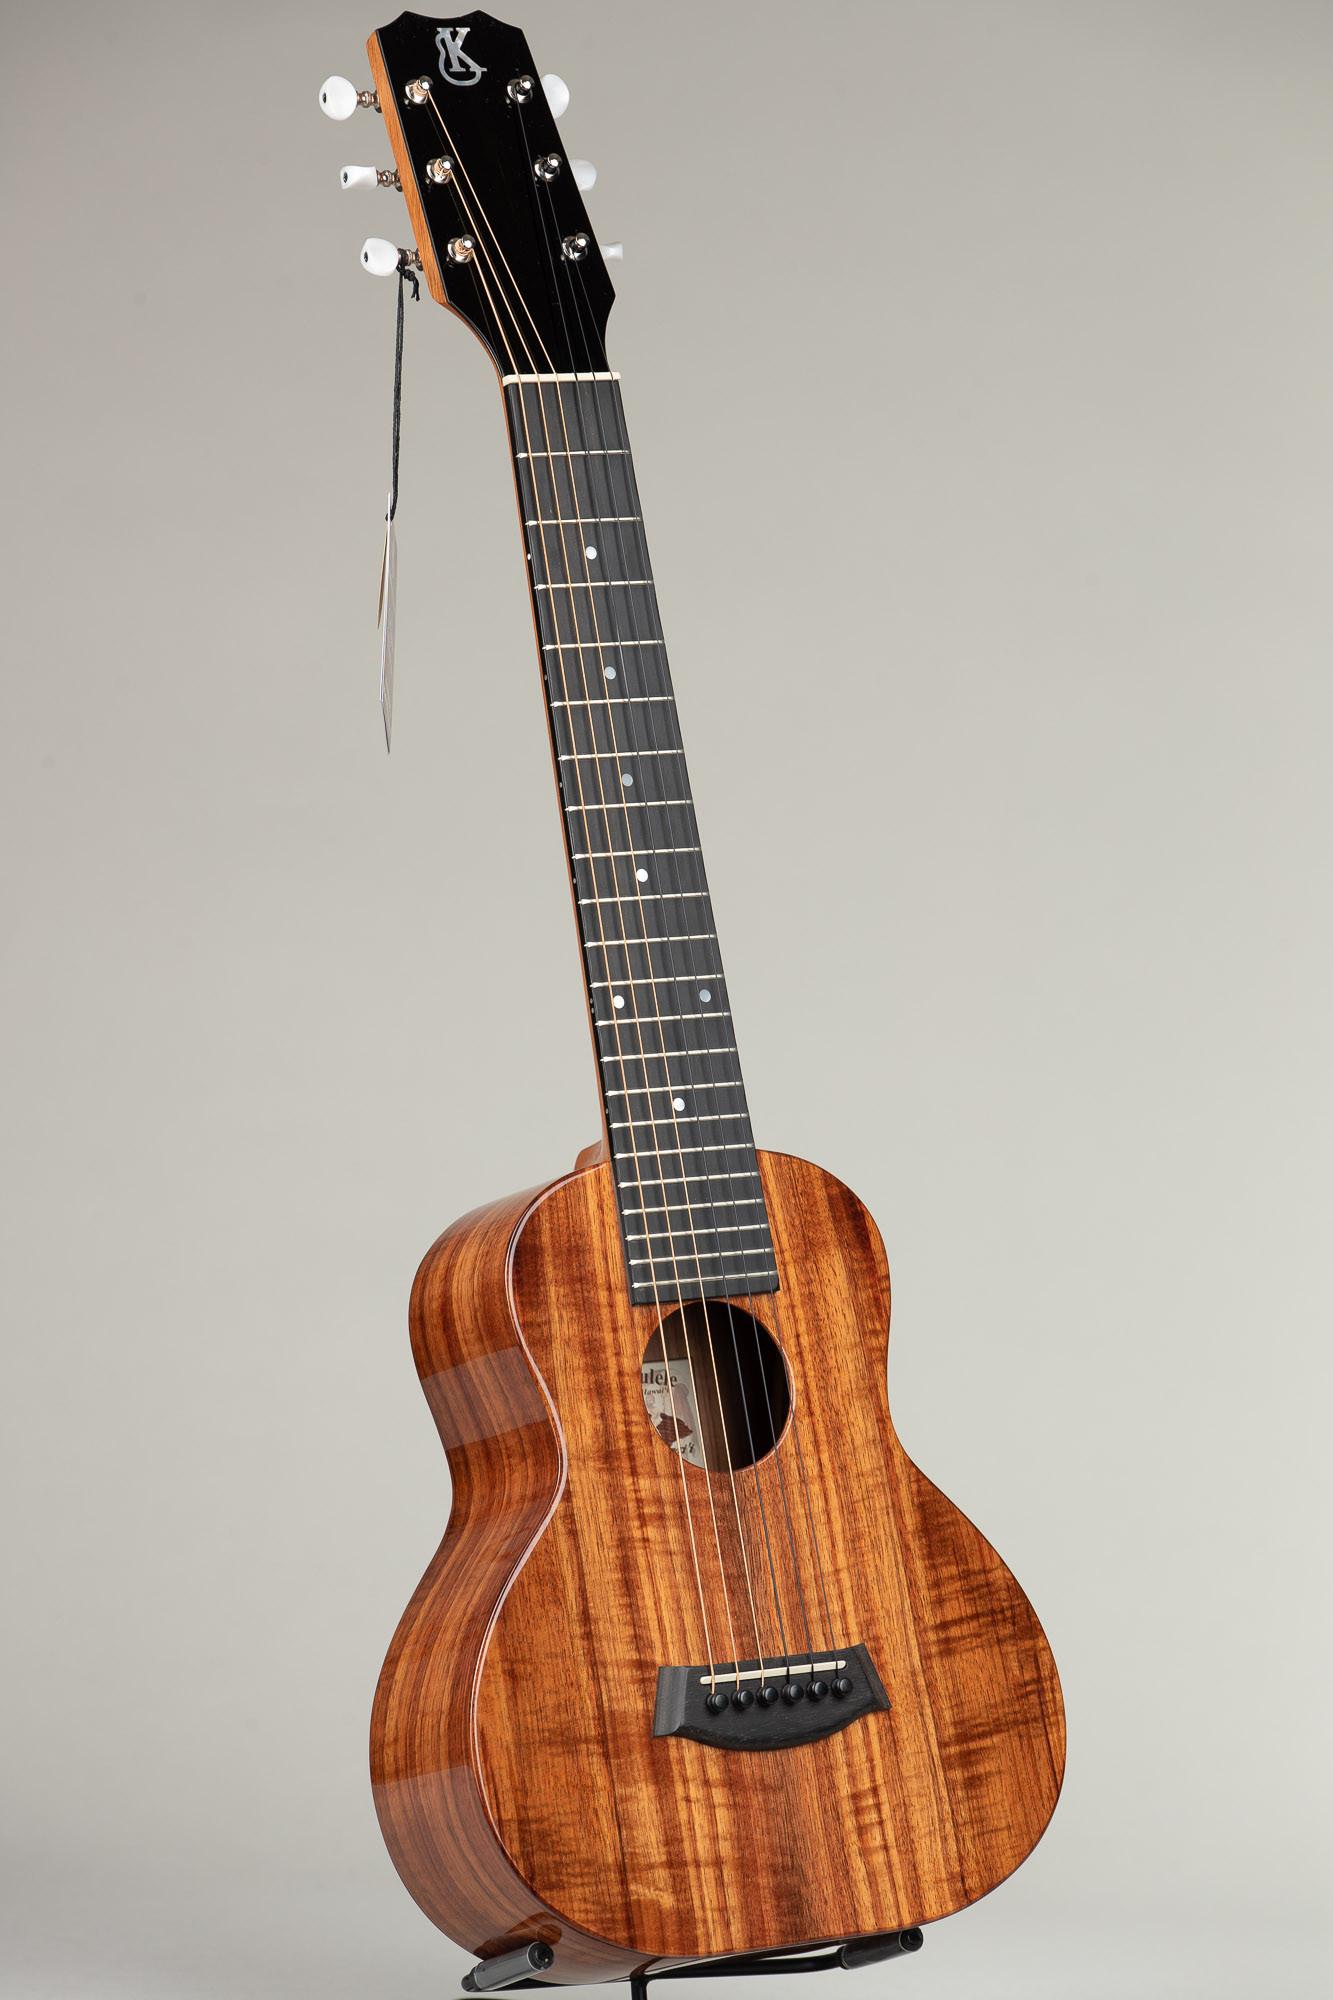 Kanile'a K-1 Koa Guitarlele (K-1 GL6 DLX, 24384)